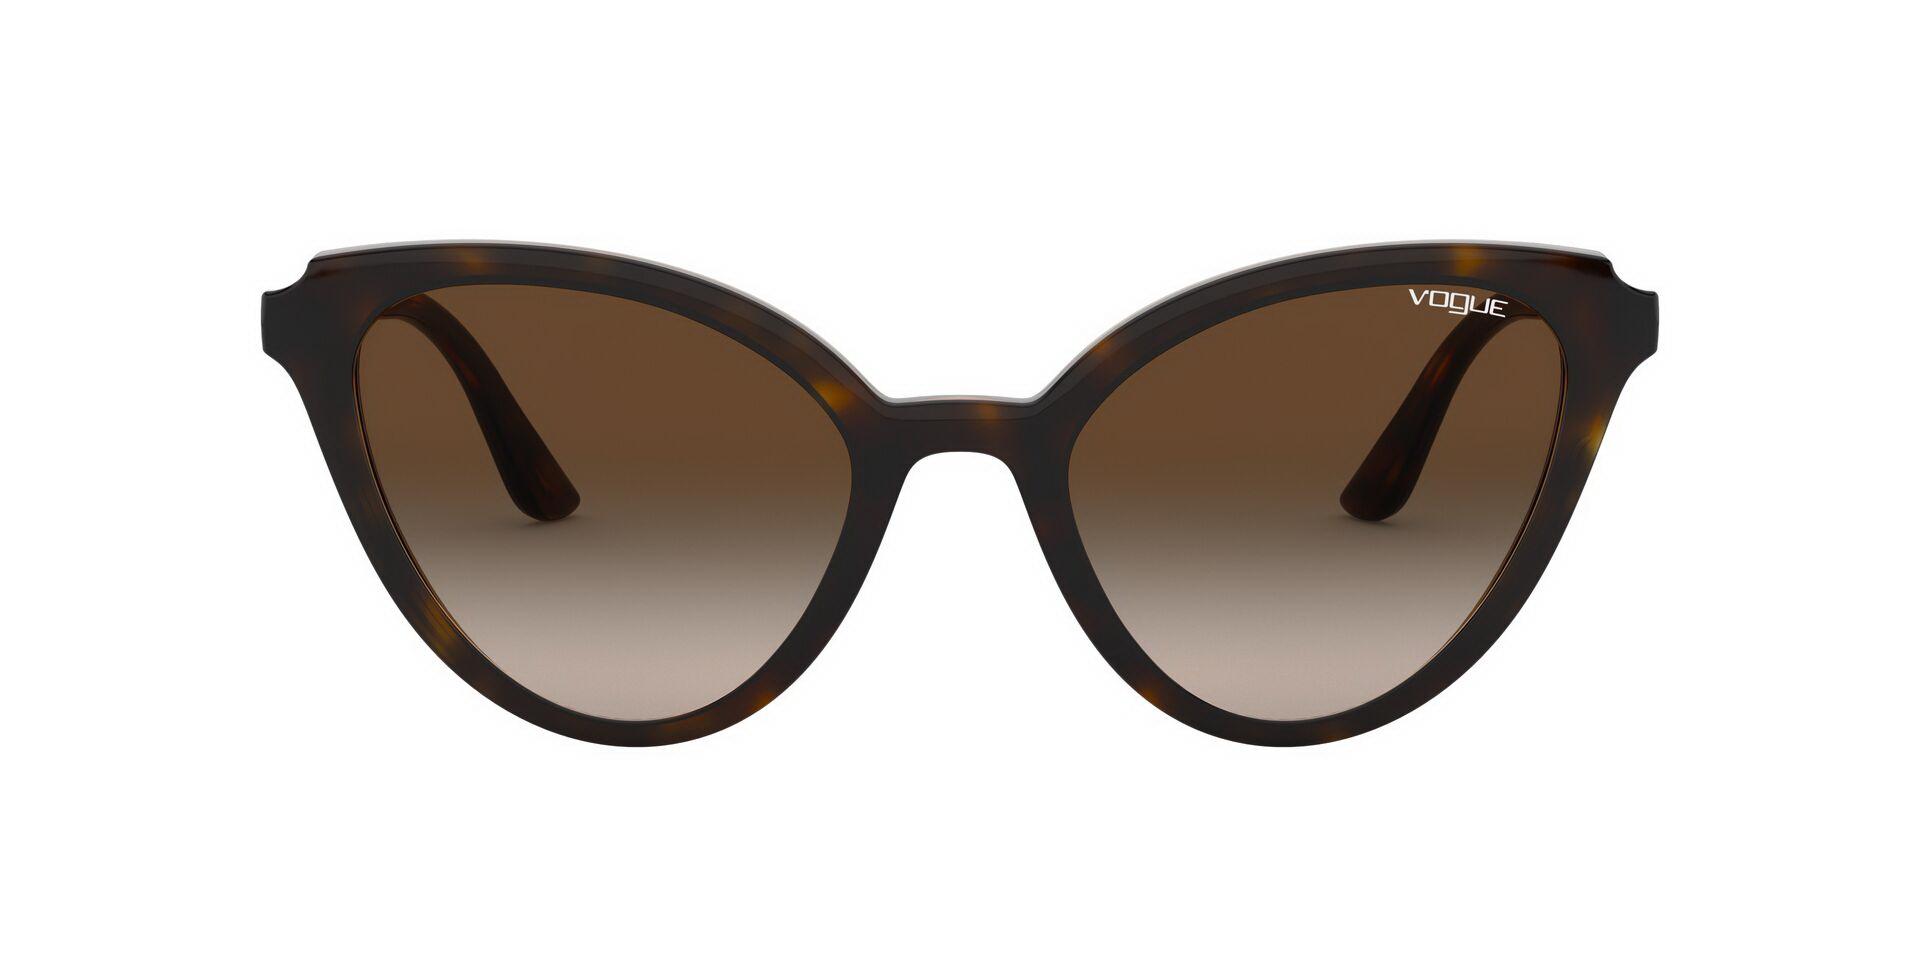 Солнцезащитные очки Очки с/з VOGUE 0VO5294S W65613 фото